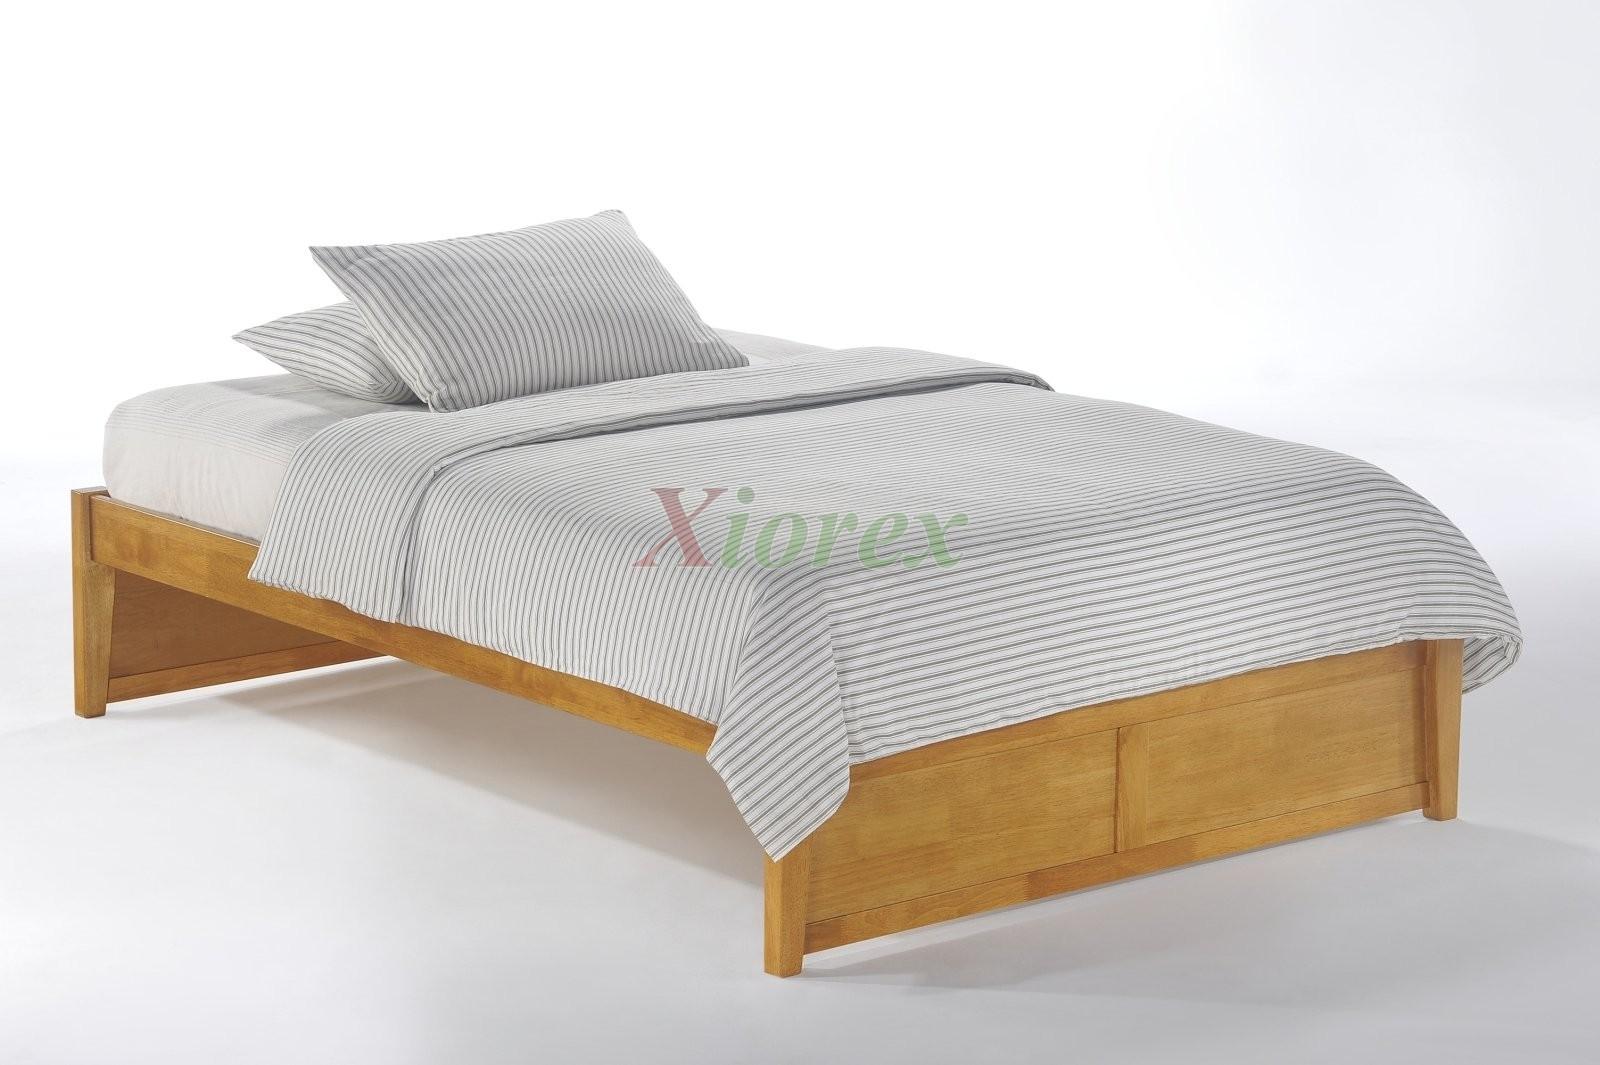 Bedroom furniture spices night day basic bed set for Spring hill designs bedroom furniture